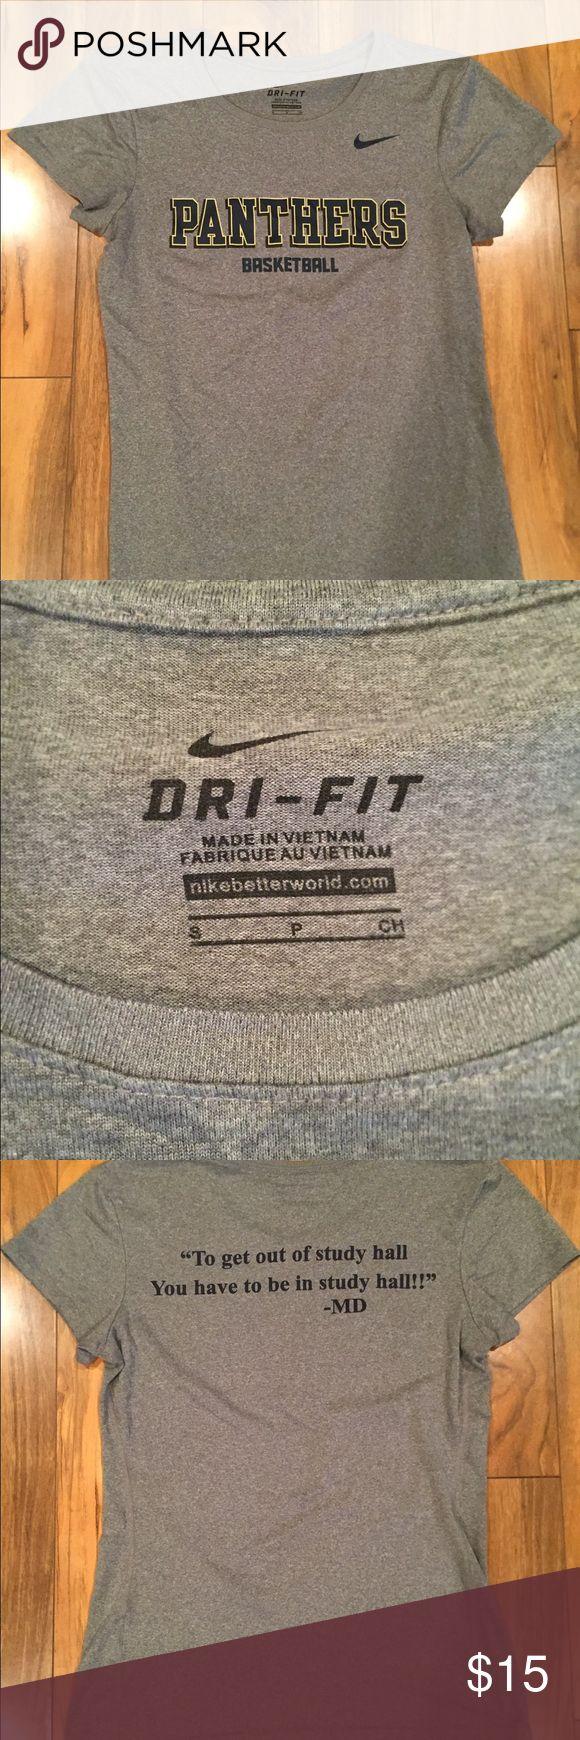 Pitt Panthers Basketball T Shirt New Nike Tops Tees - Short Sleeve